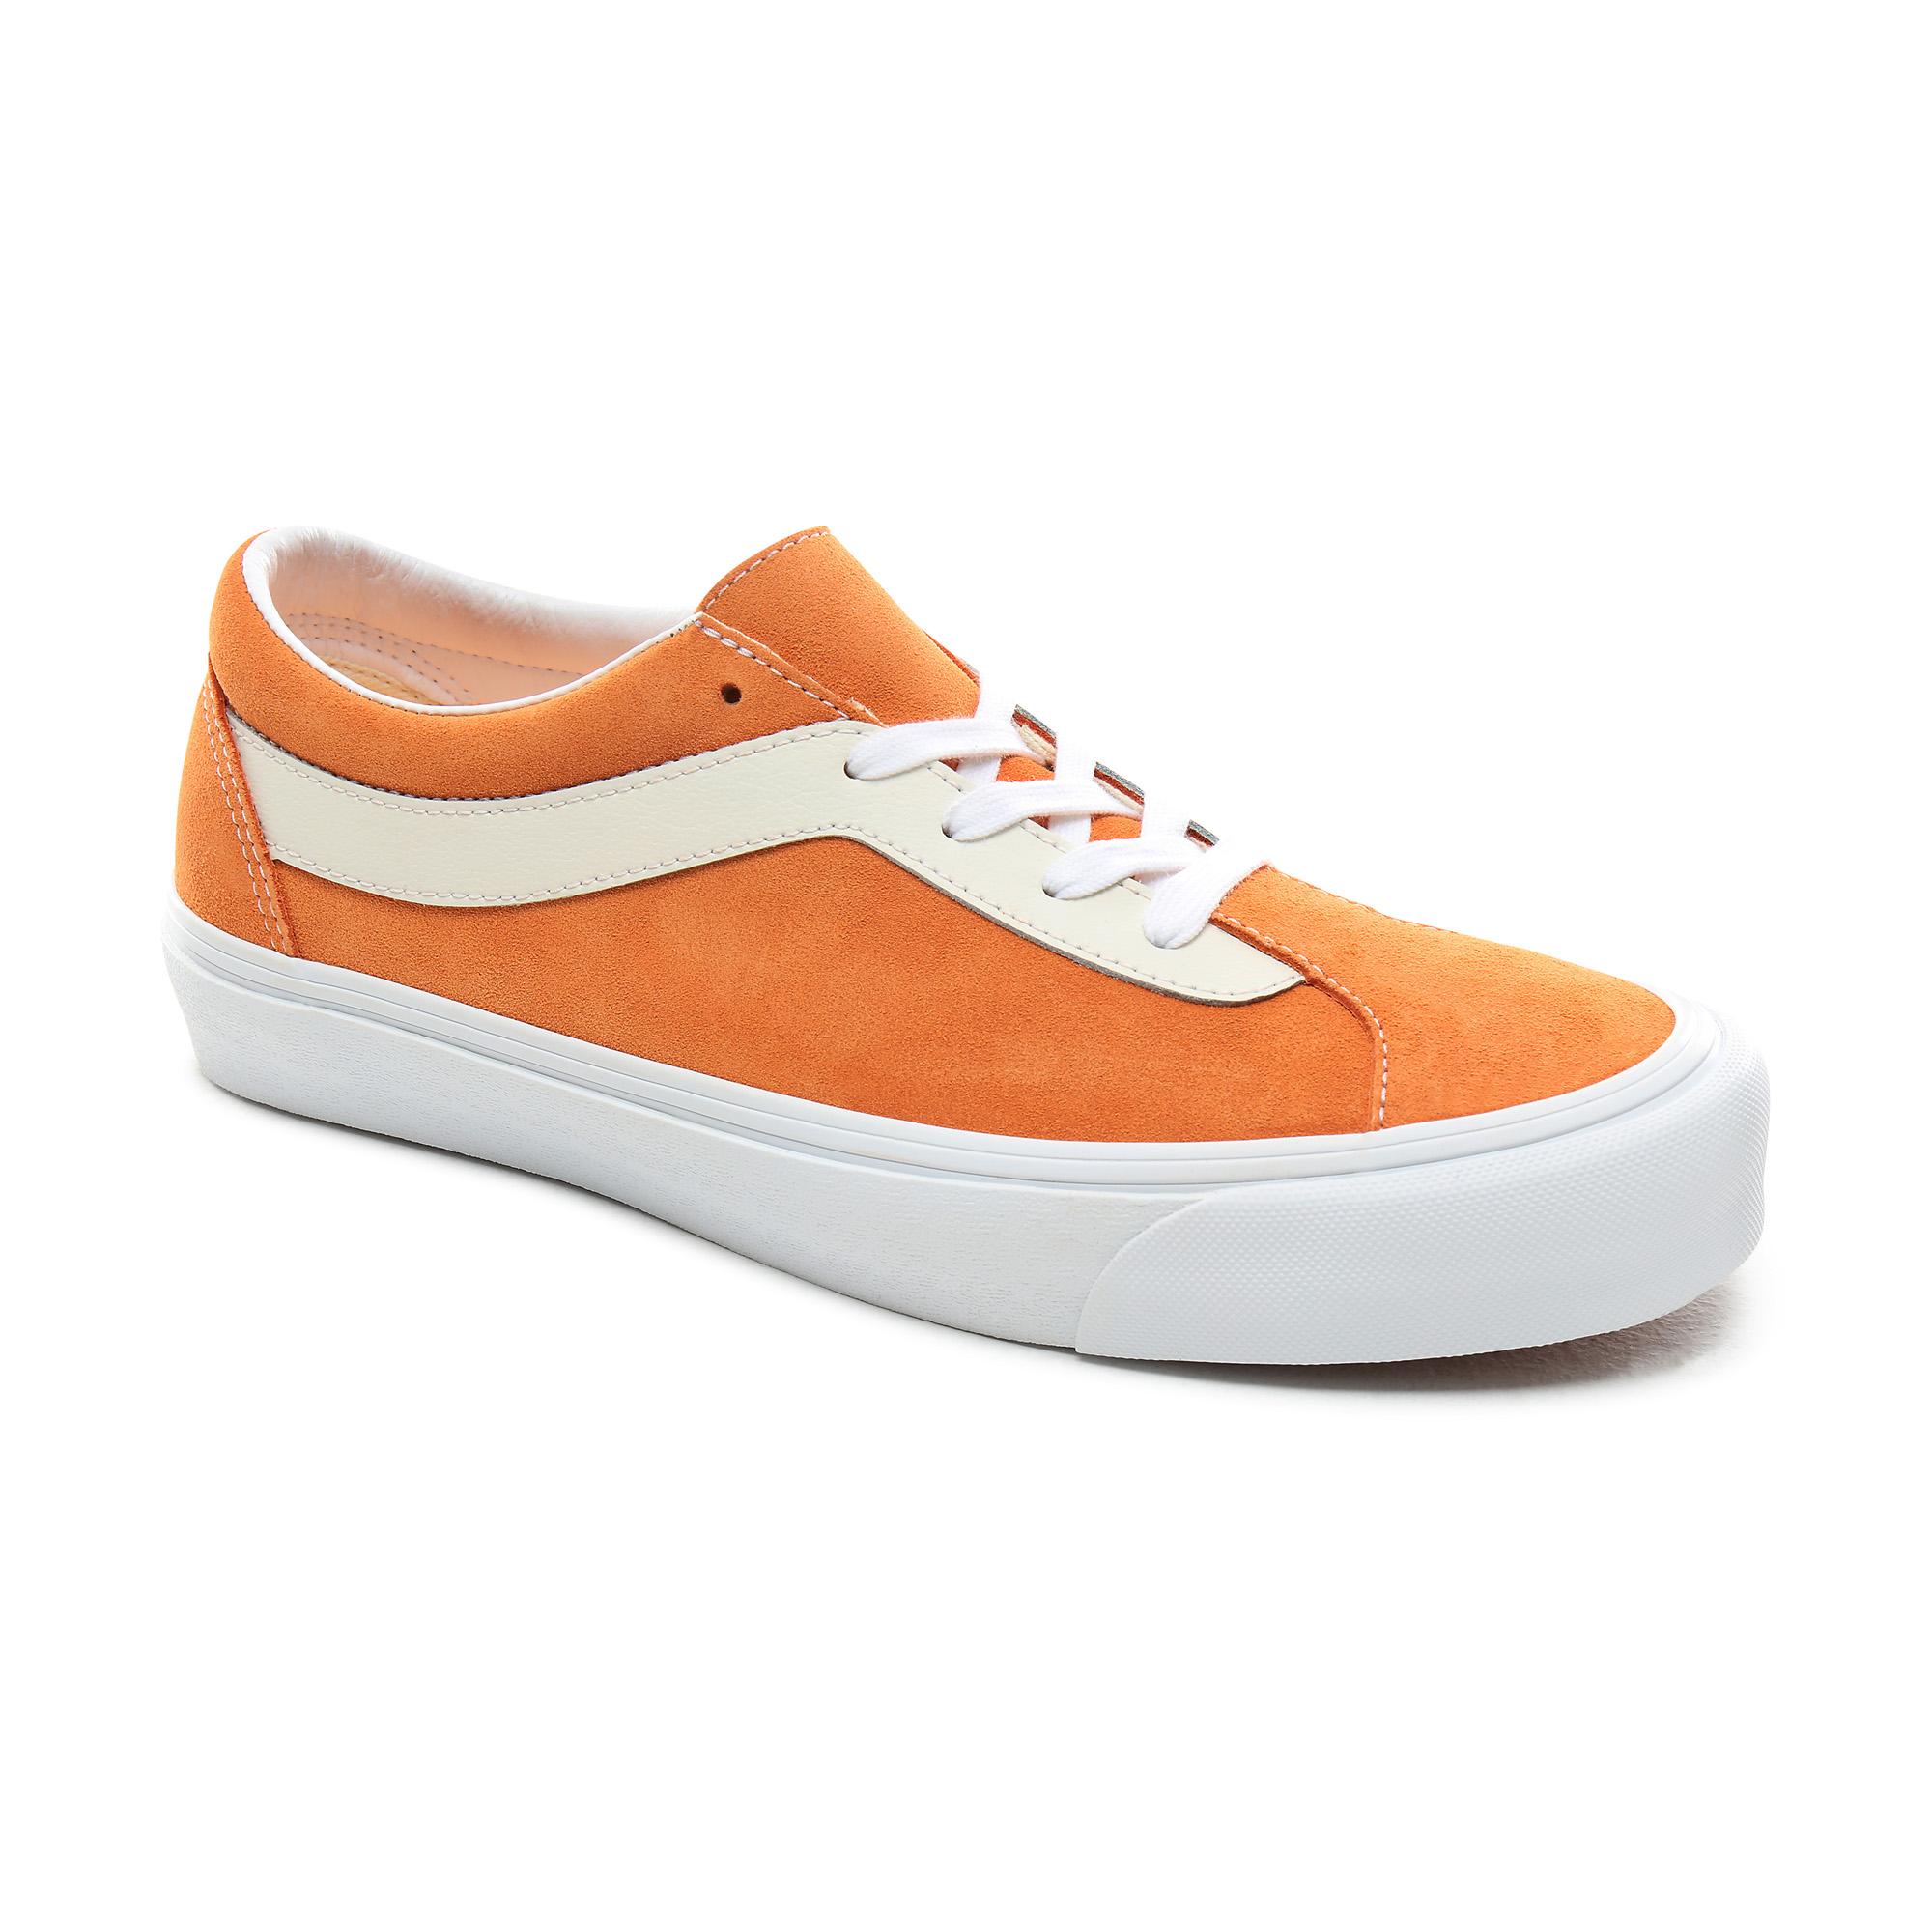 Фото 4 - Кеды Bold Ni оранжевого цвета